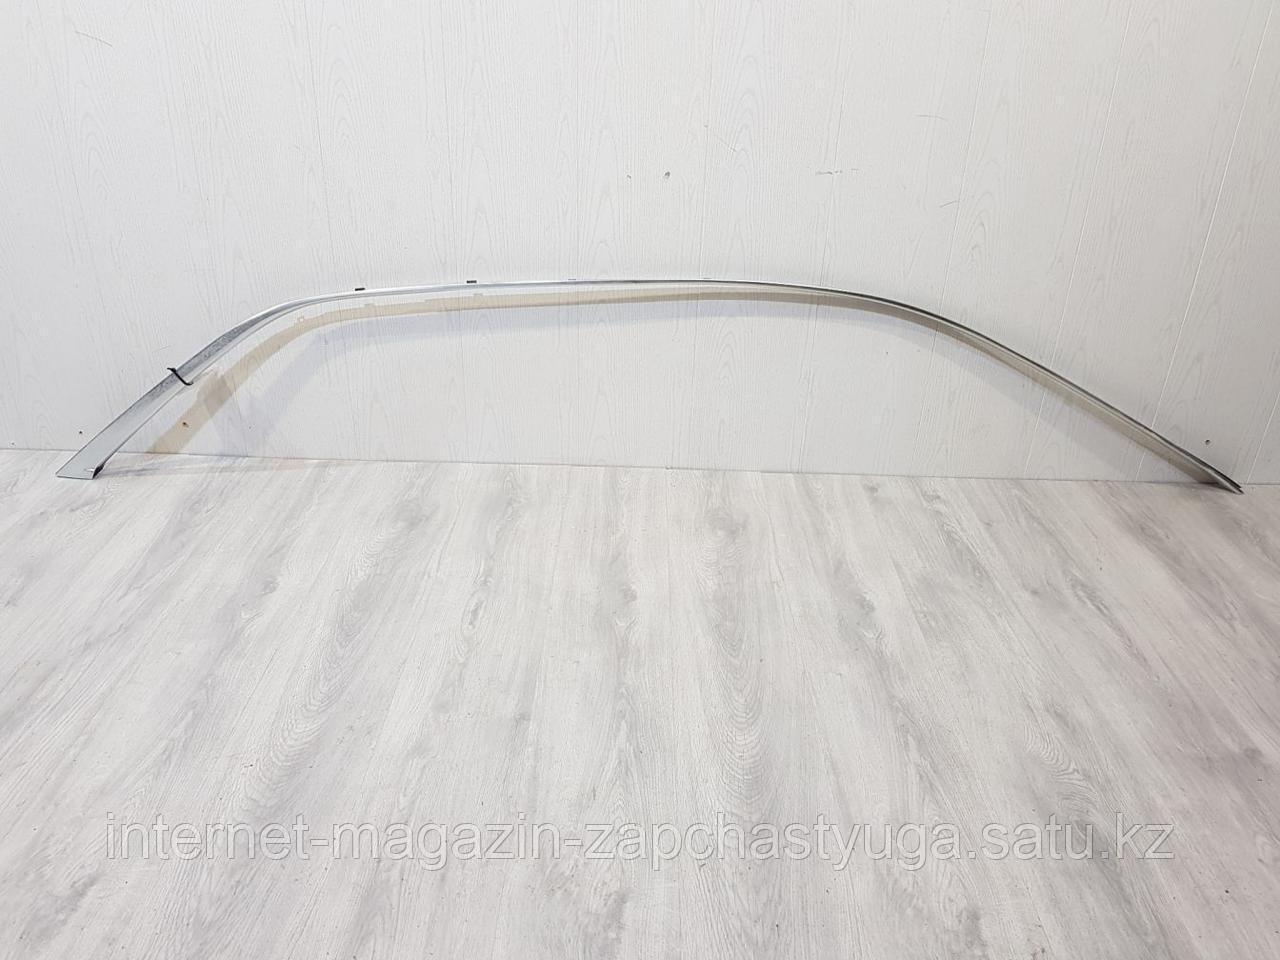 22744644 Молдинг кузова правый для Cadillac CTS 2013- Б/У - фото 1